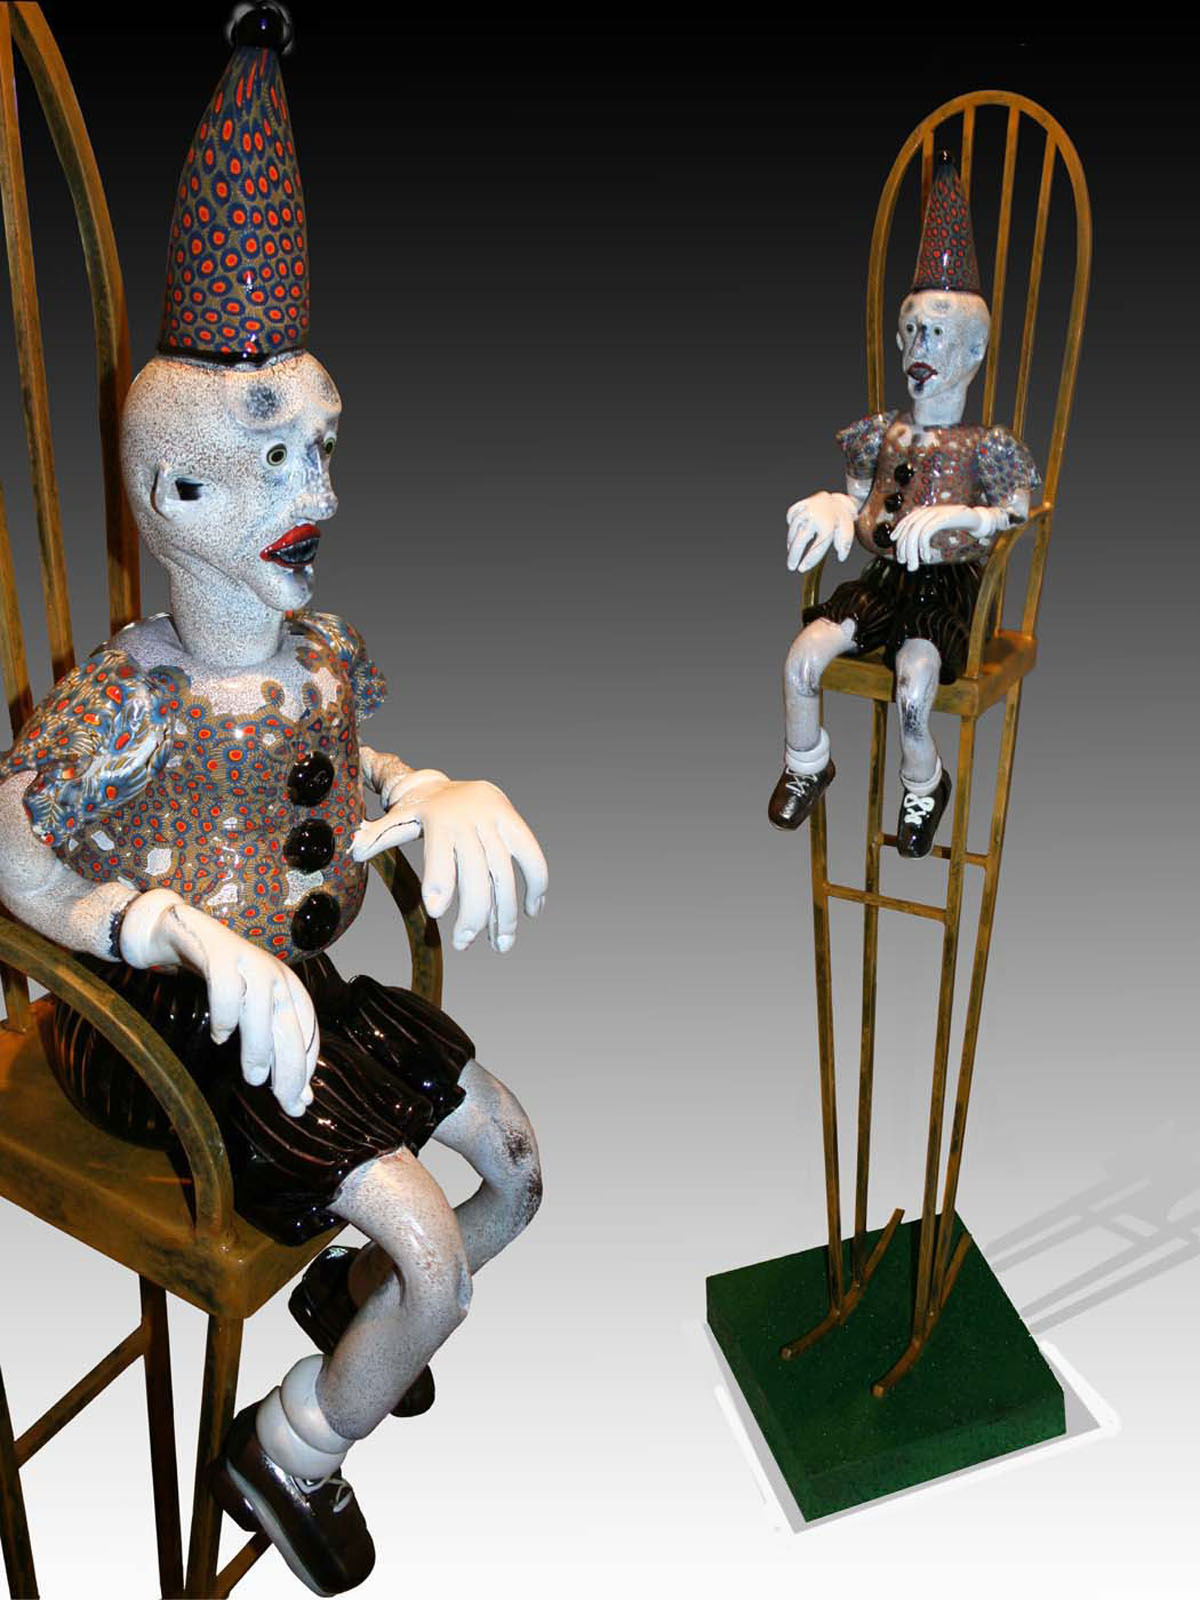 seated figure copy.jpg